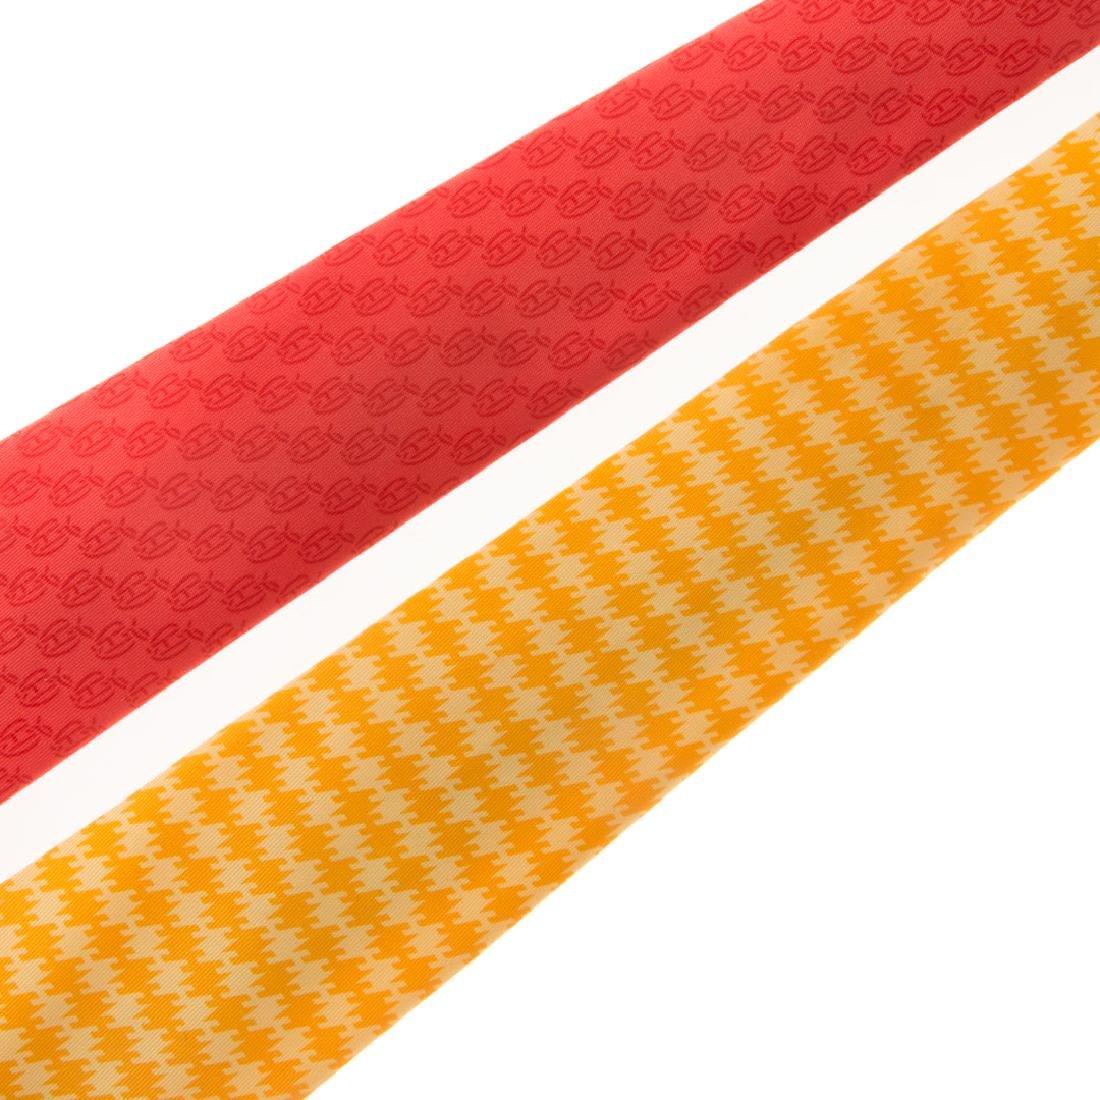 Hermès Apple Print Tie & Hounds Tooth Print Tie - 2